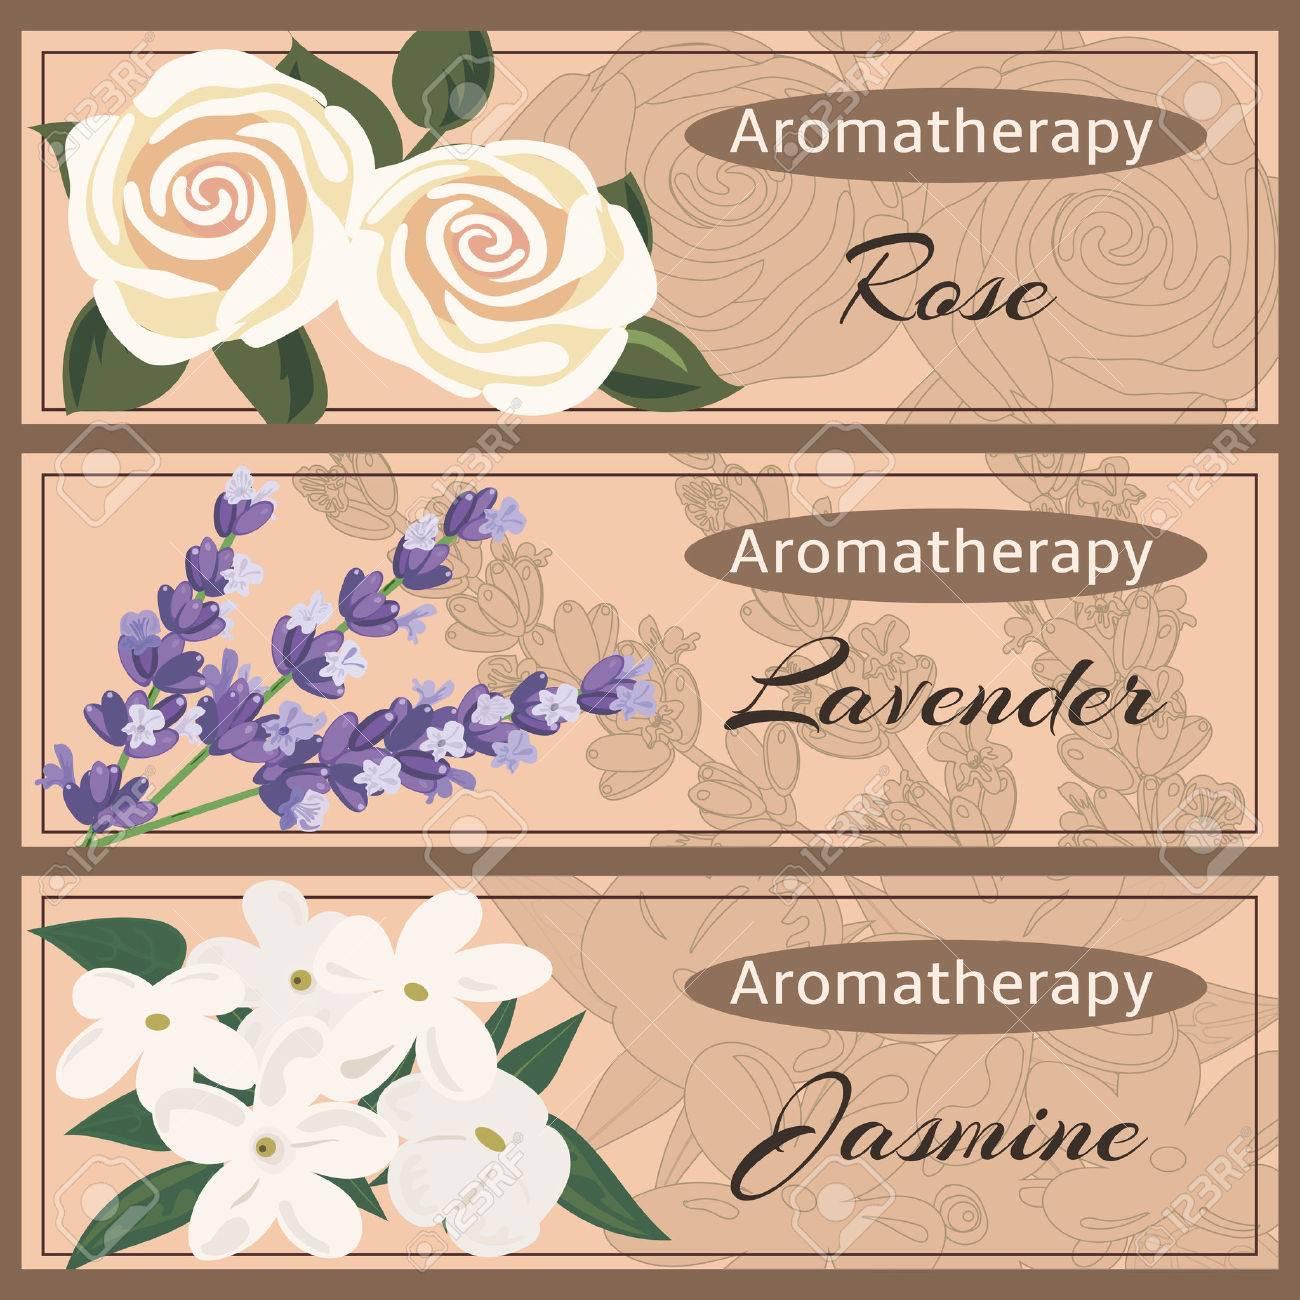 Aromatherapy set collection. Rose, lavender, jasmine banner set. - 57259632